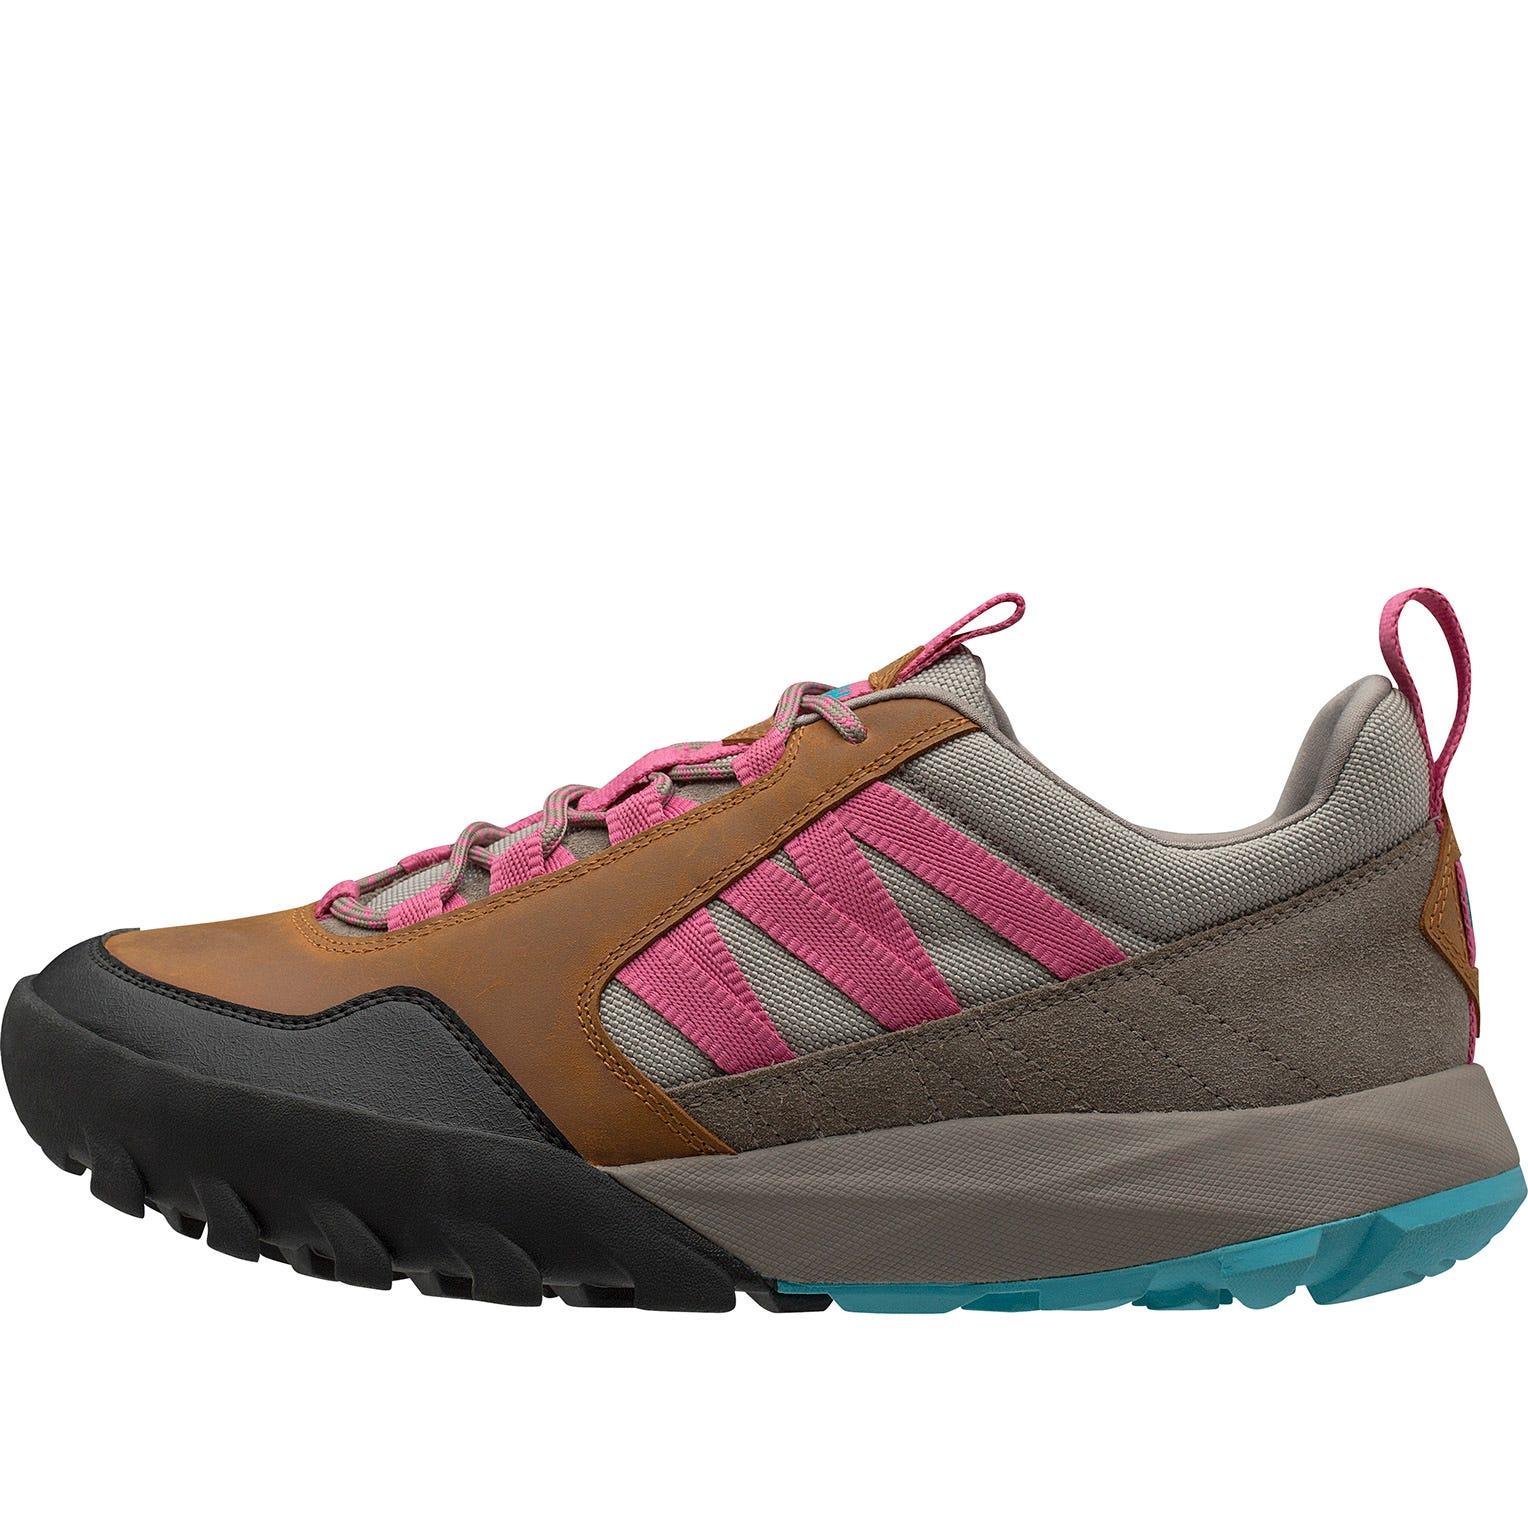 Helly Hansen W Loke Bowron Leather Womens Hiking Boot Brown 42/10